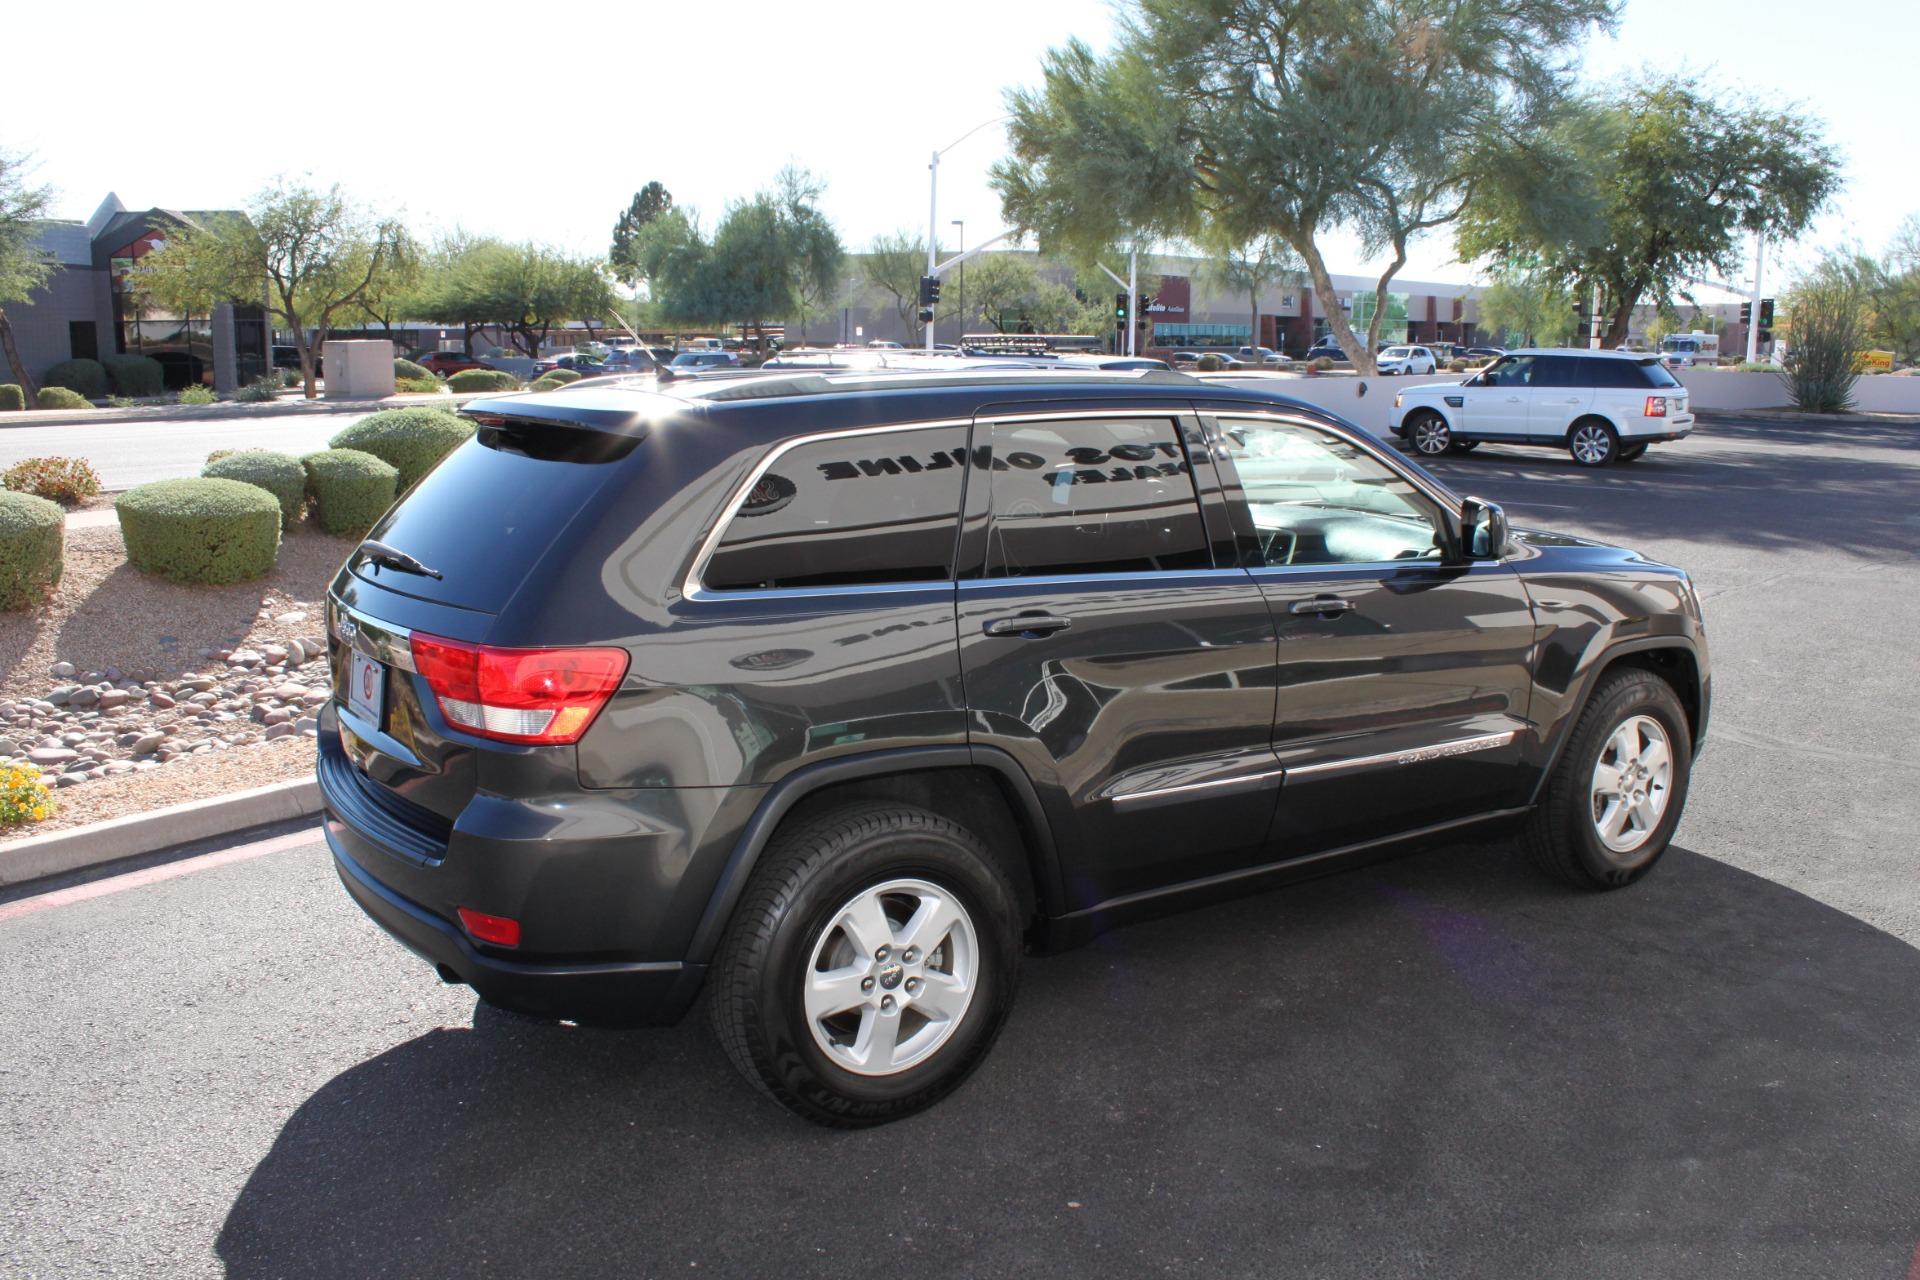 Used-2011-Jeep-Grand-Cherokee-Laredo-Chevelle